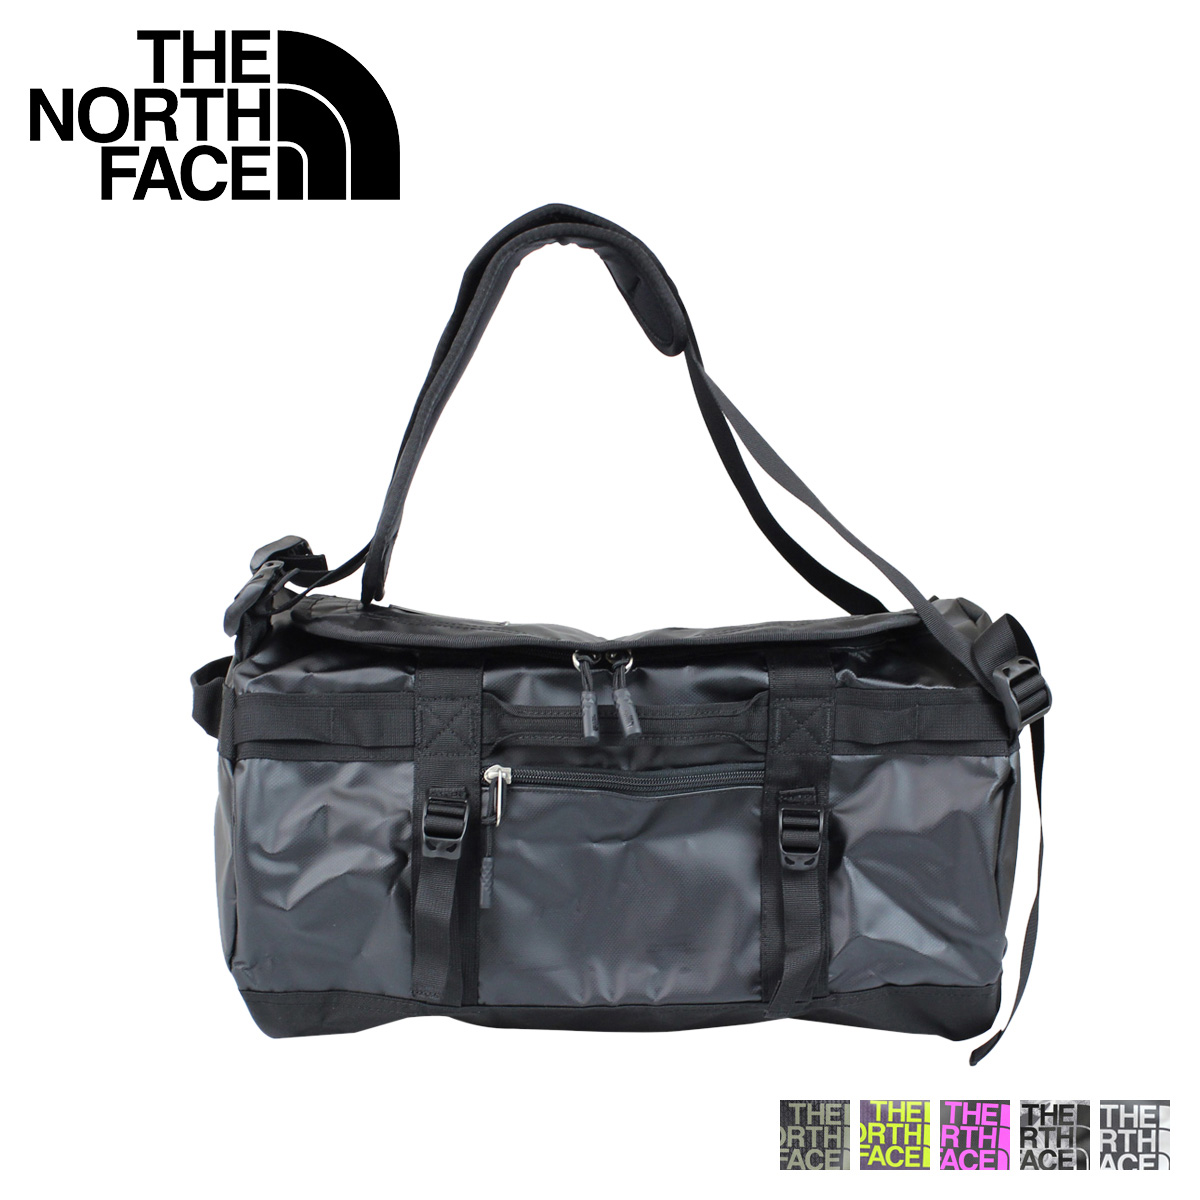 db31a3463 THE NORTH FACE BASE CAMP DUFFEL-XS North Face bag Boston bag duffel bag 33L  men's Lady's